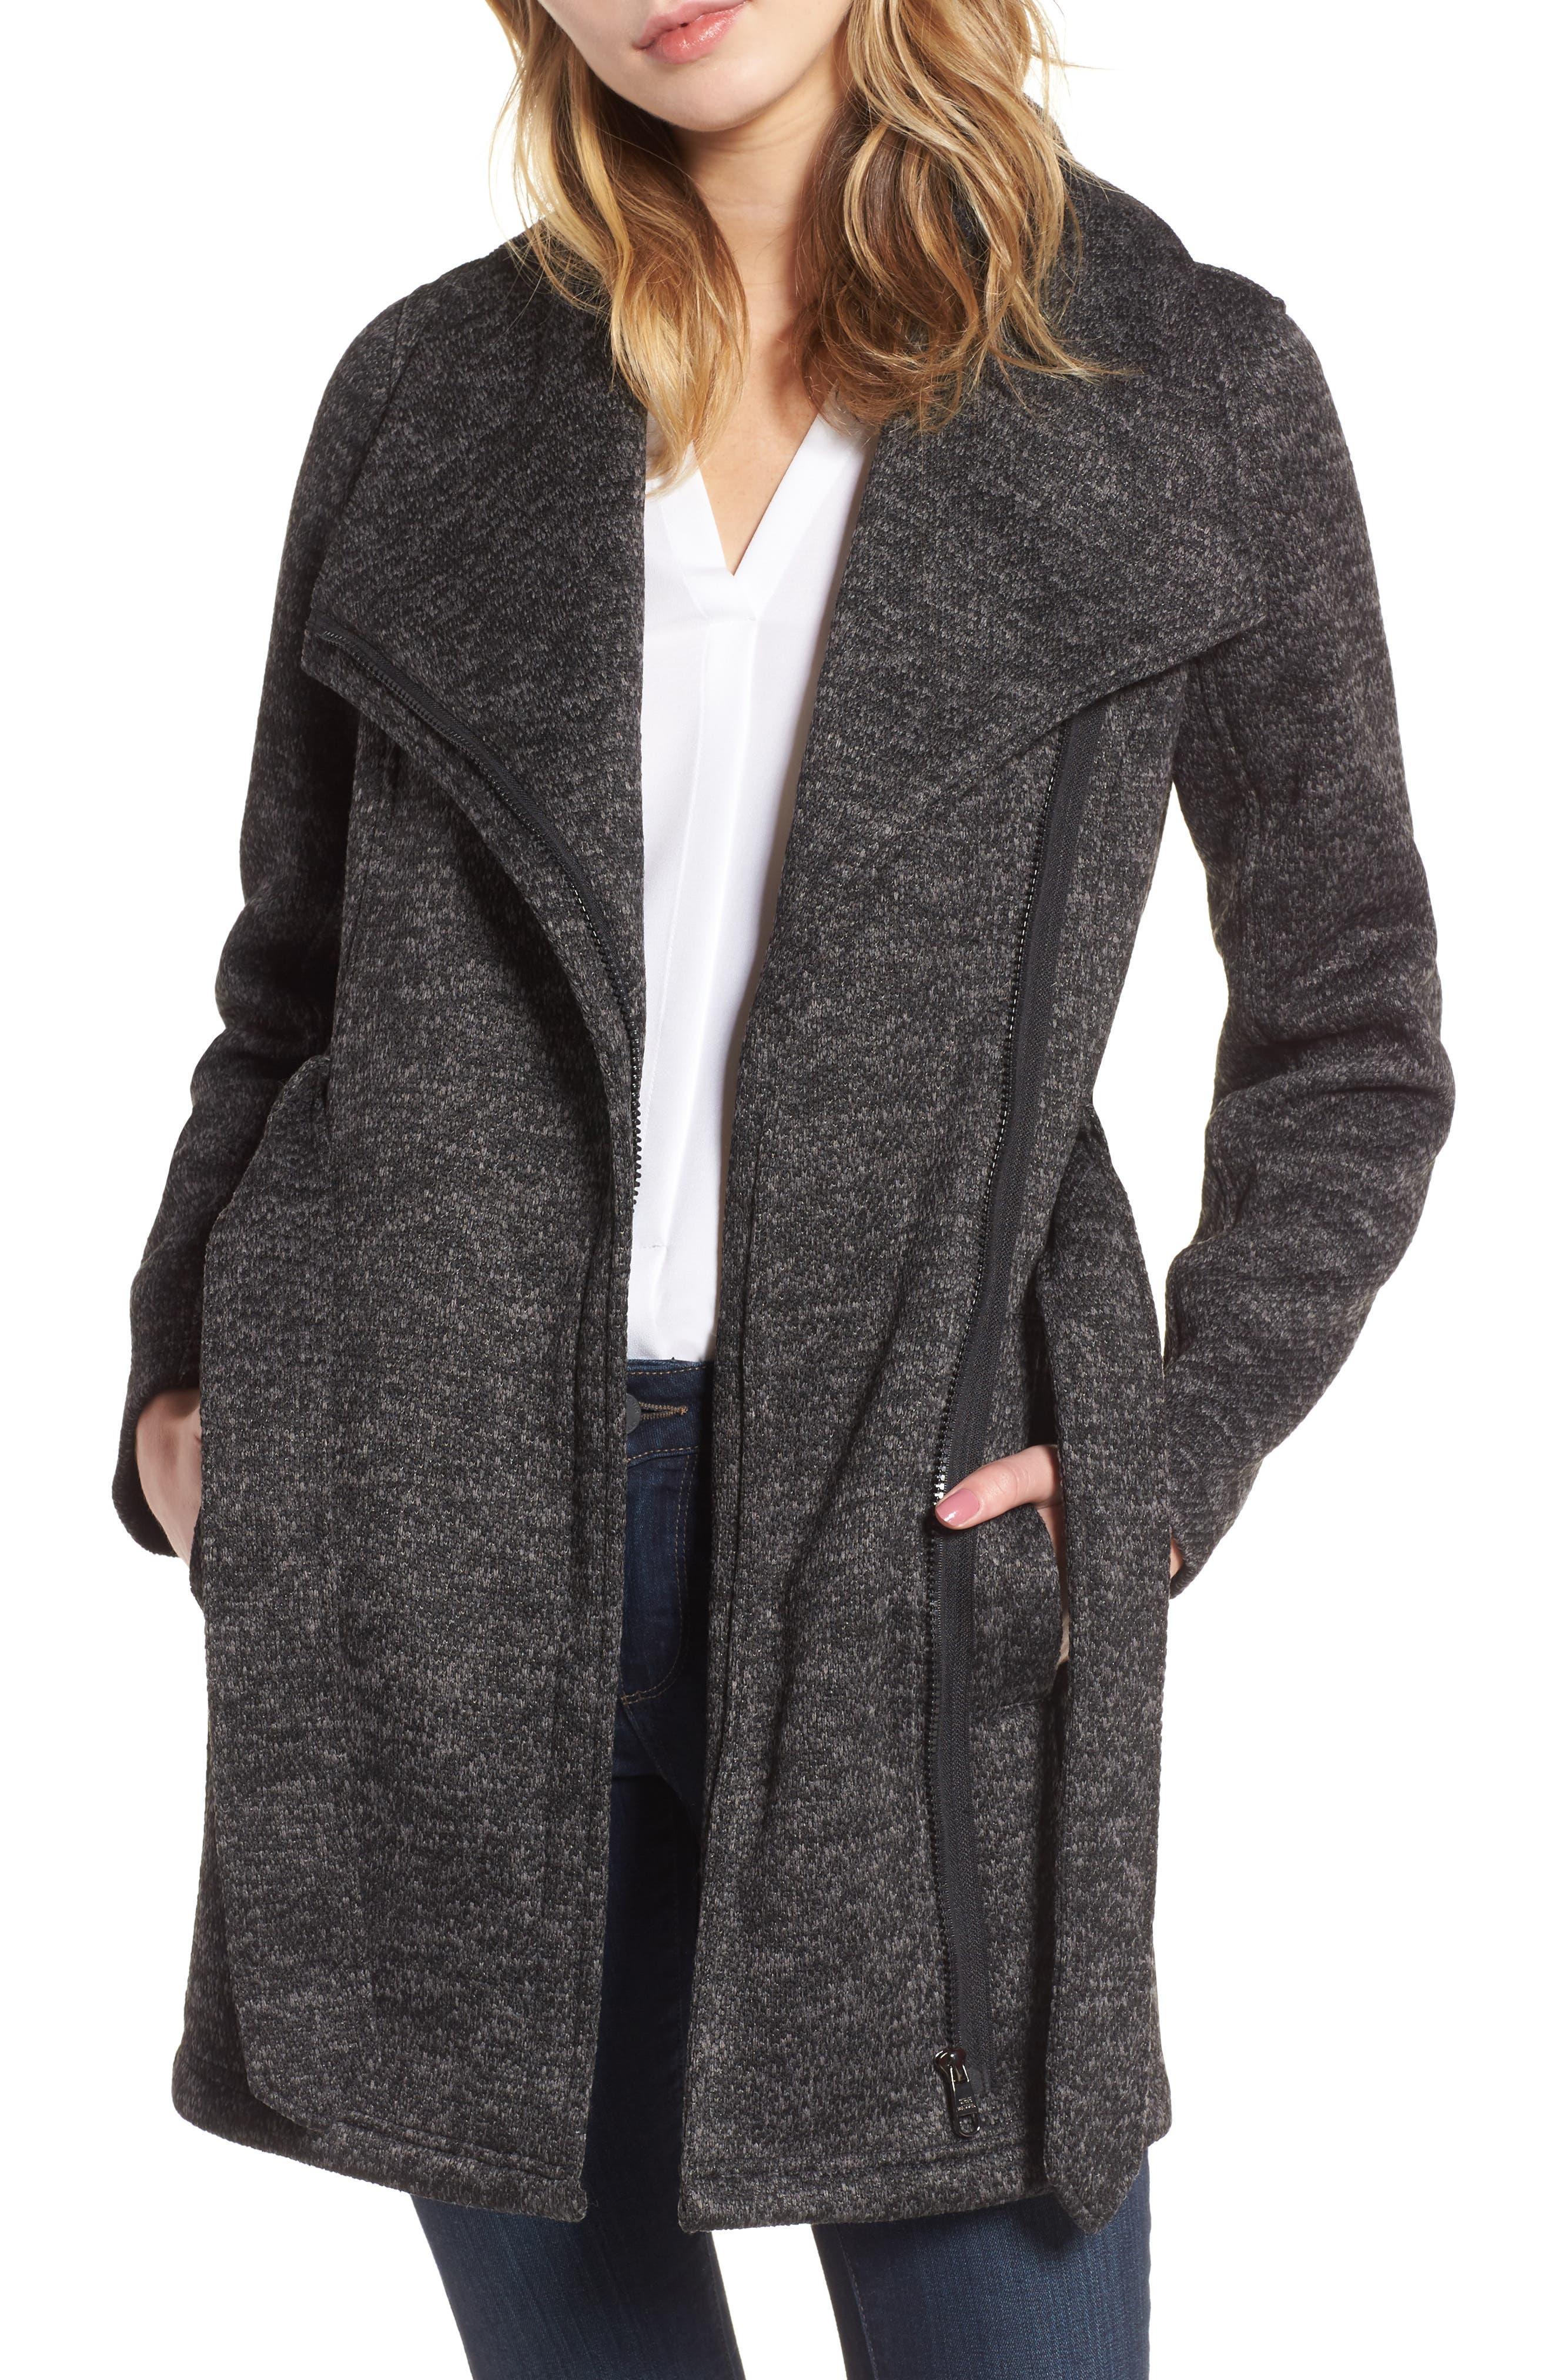 Fleece Wrap Coat,                             Alternate thumbnail 3, color,                             Charcoal Heather